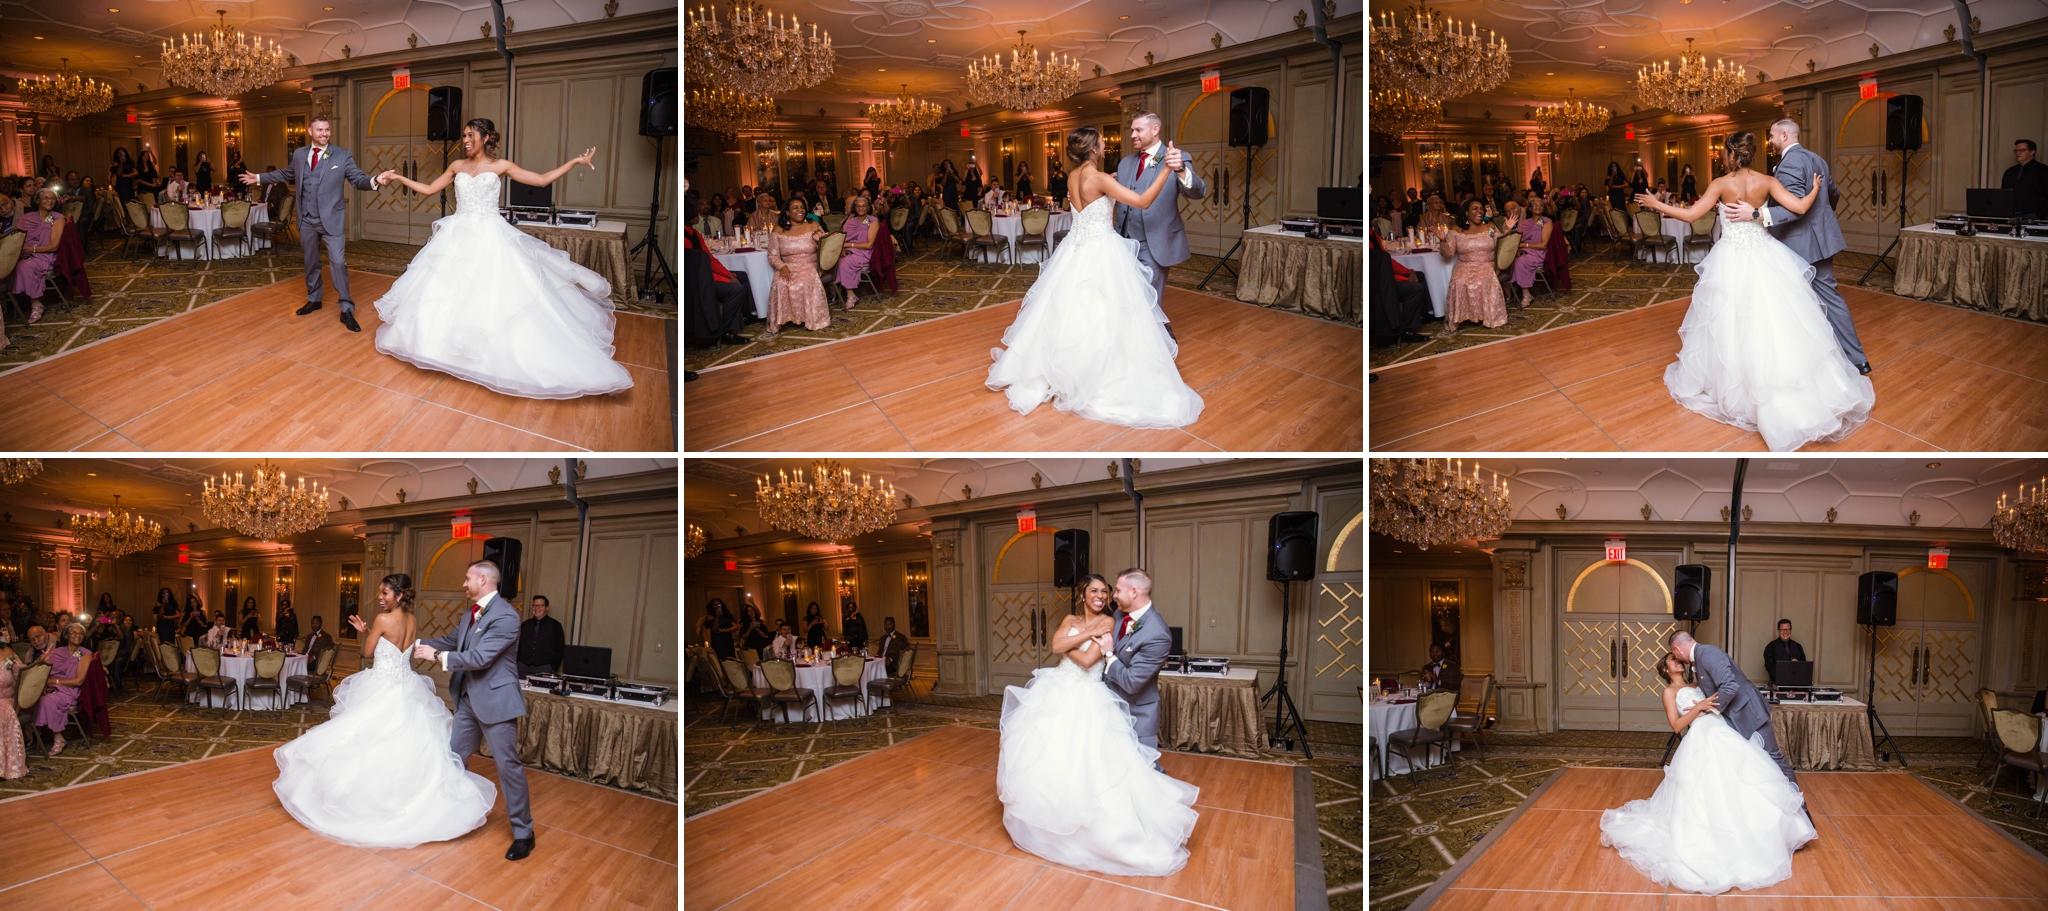 Nicole + Daniel - Wedding Photography at Grand Bohemian Hotel Asheville, North Carolina